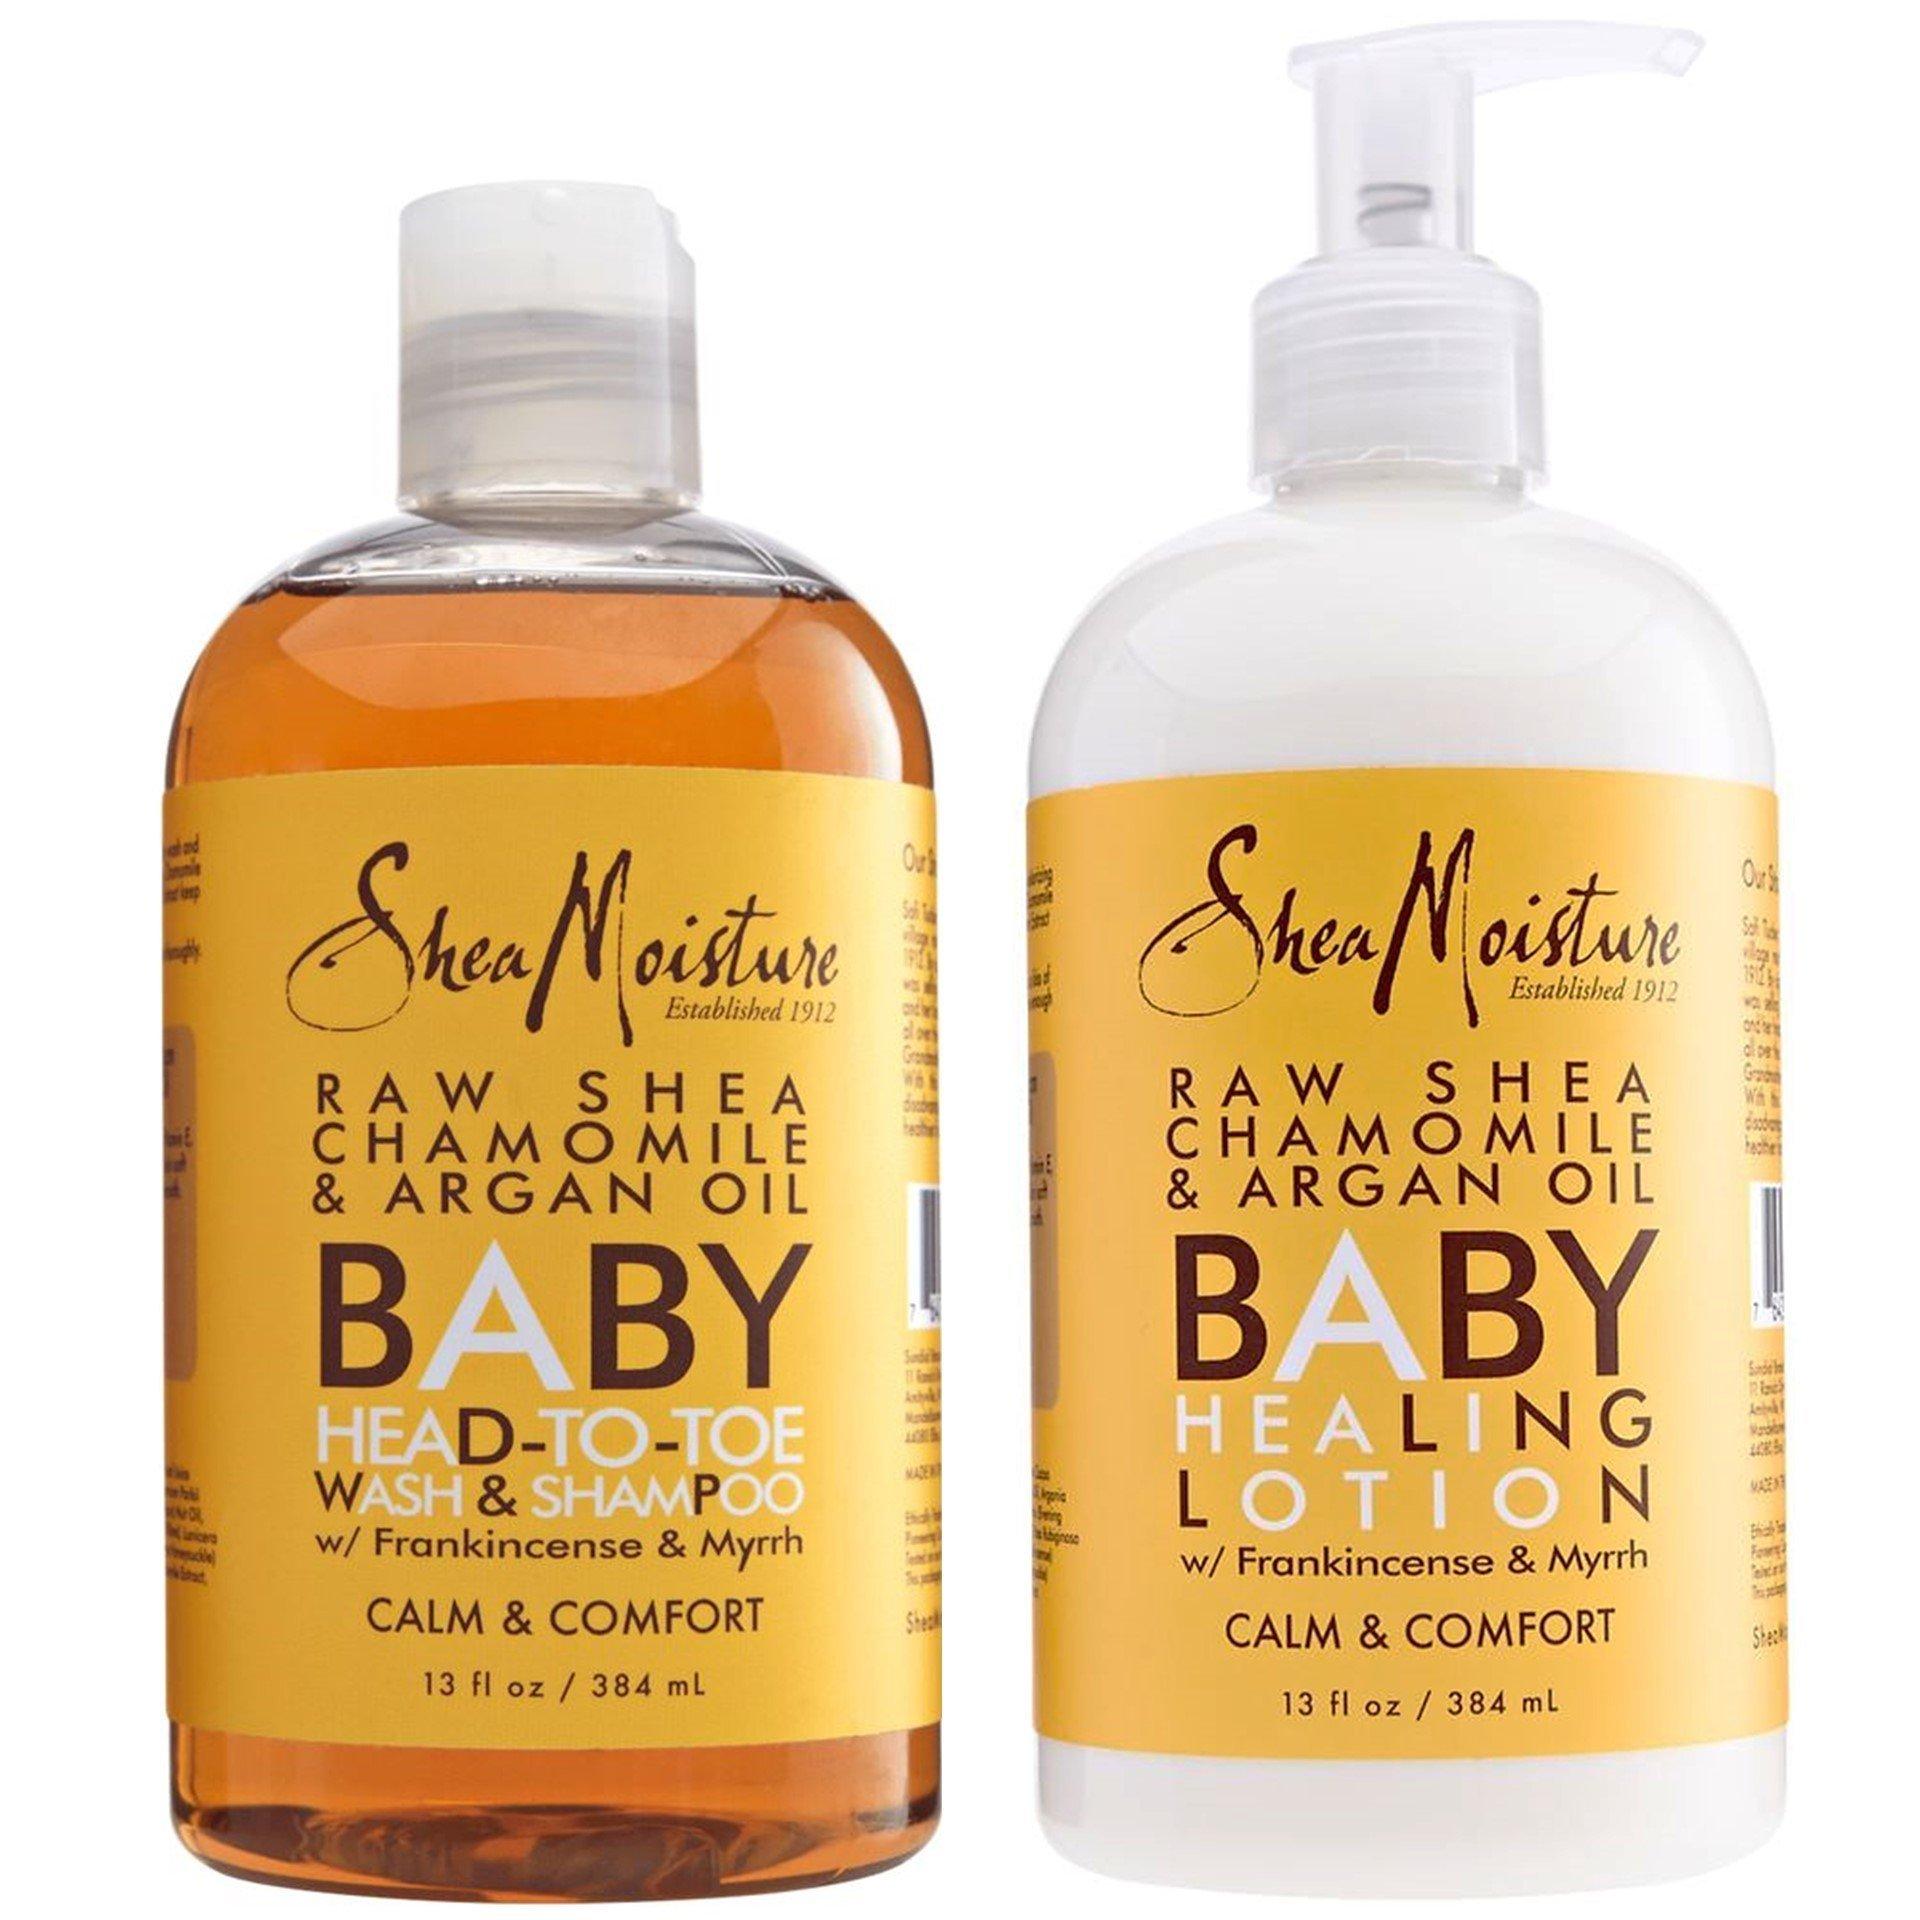 Shea Moisture Calm and Comfort Raw Shea Chamomile and Argan Oil Baby Head to Toe Wash Shampoo and Healing Lotion, 13 fl oz Each